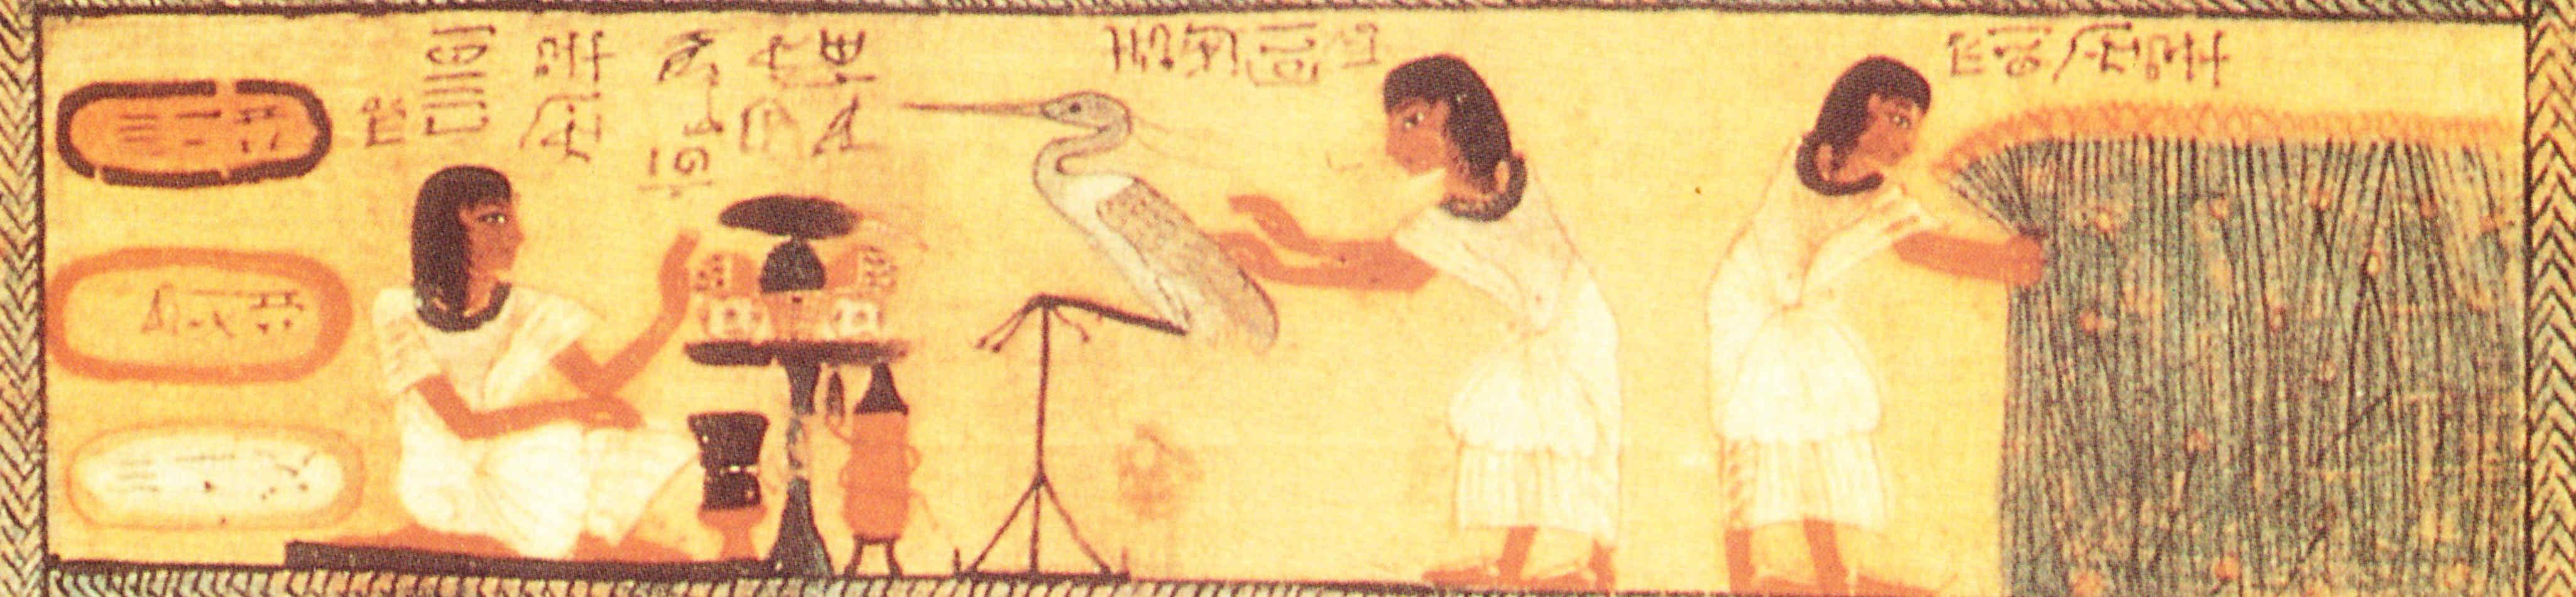 Egipto Antiguo 64 y Ptolomeo XII 7